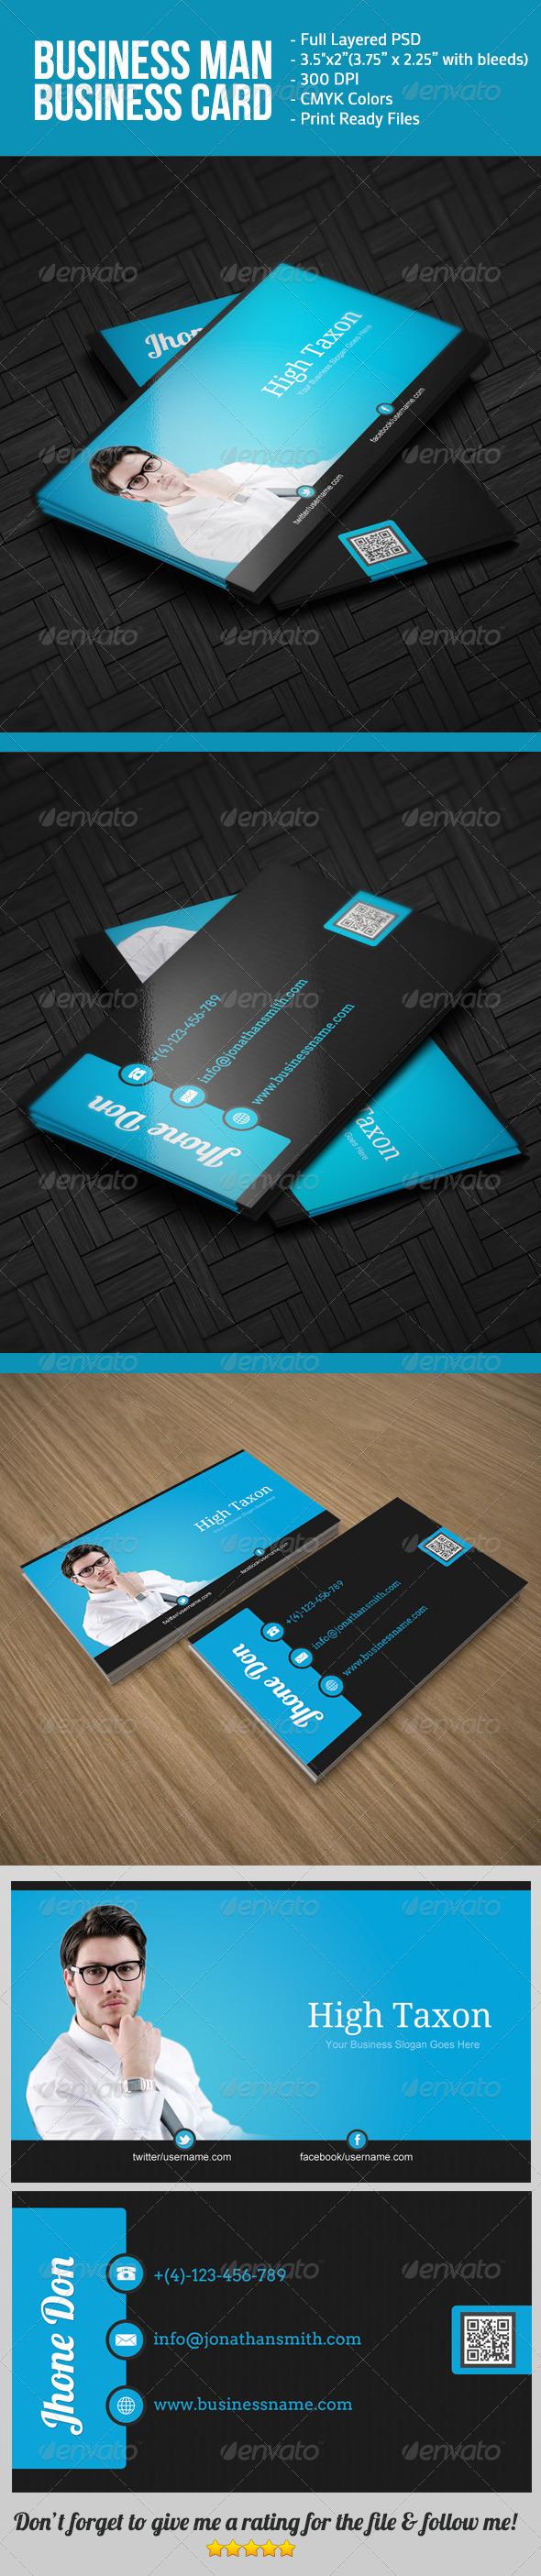 Business Man BusinessCard - Corporate Business Cards